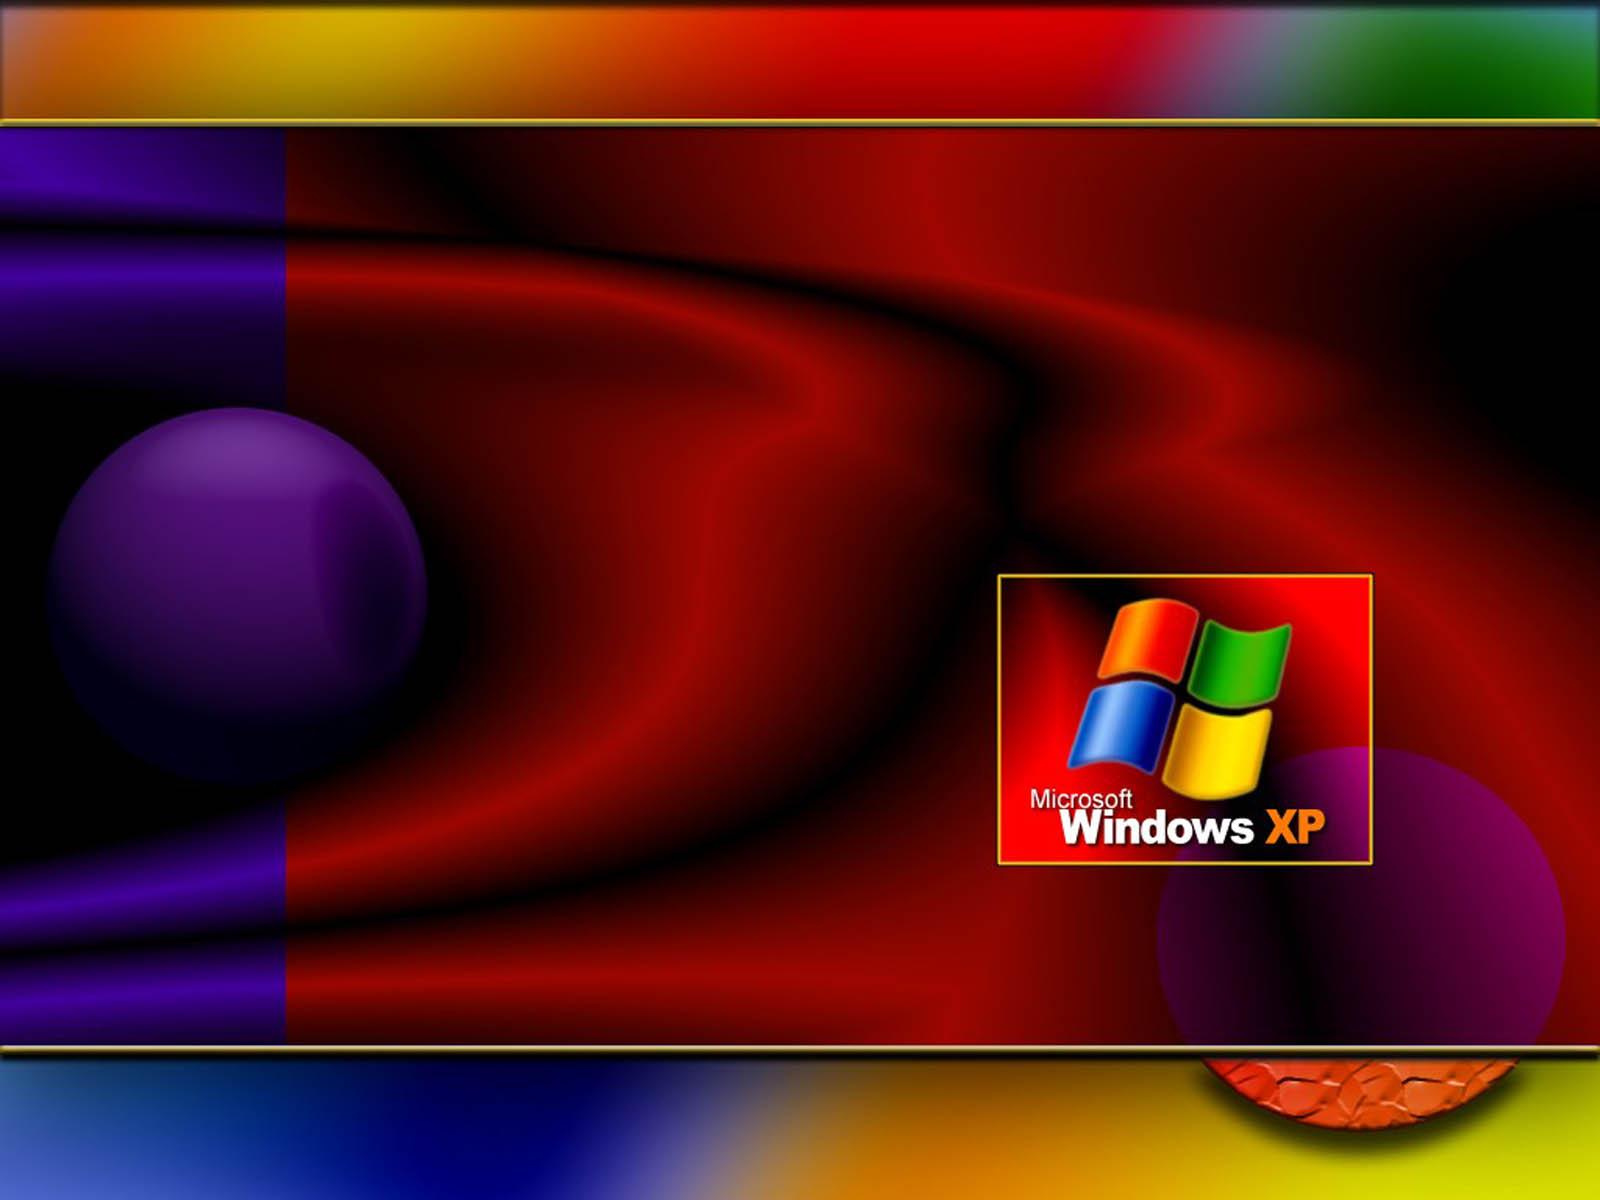 windows xp images - photo #29